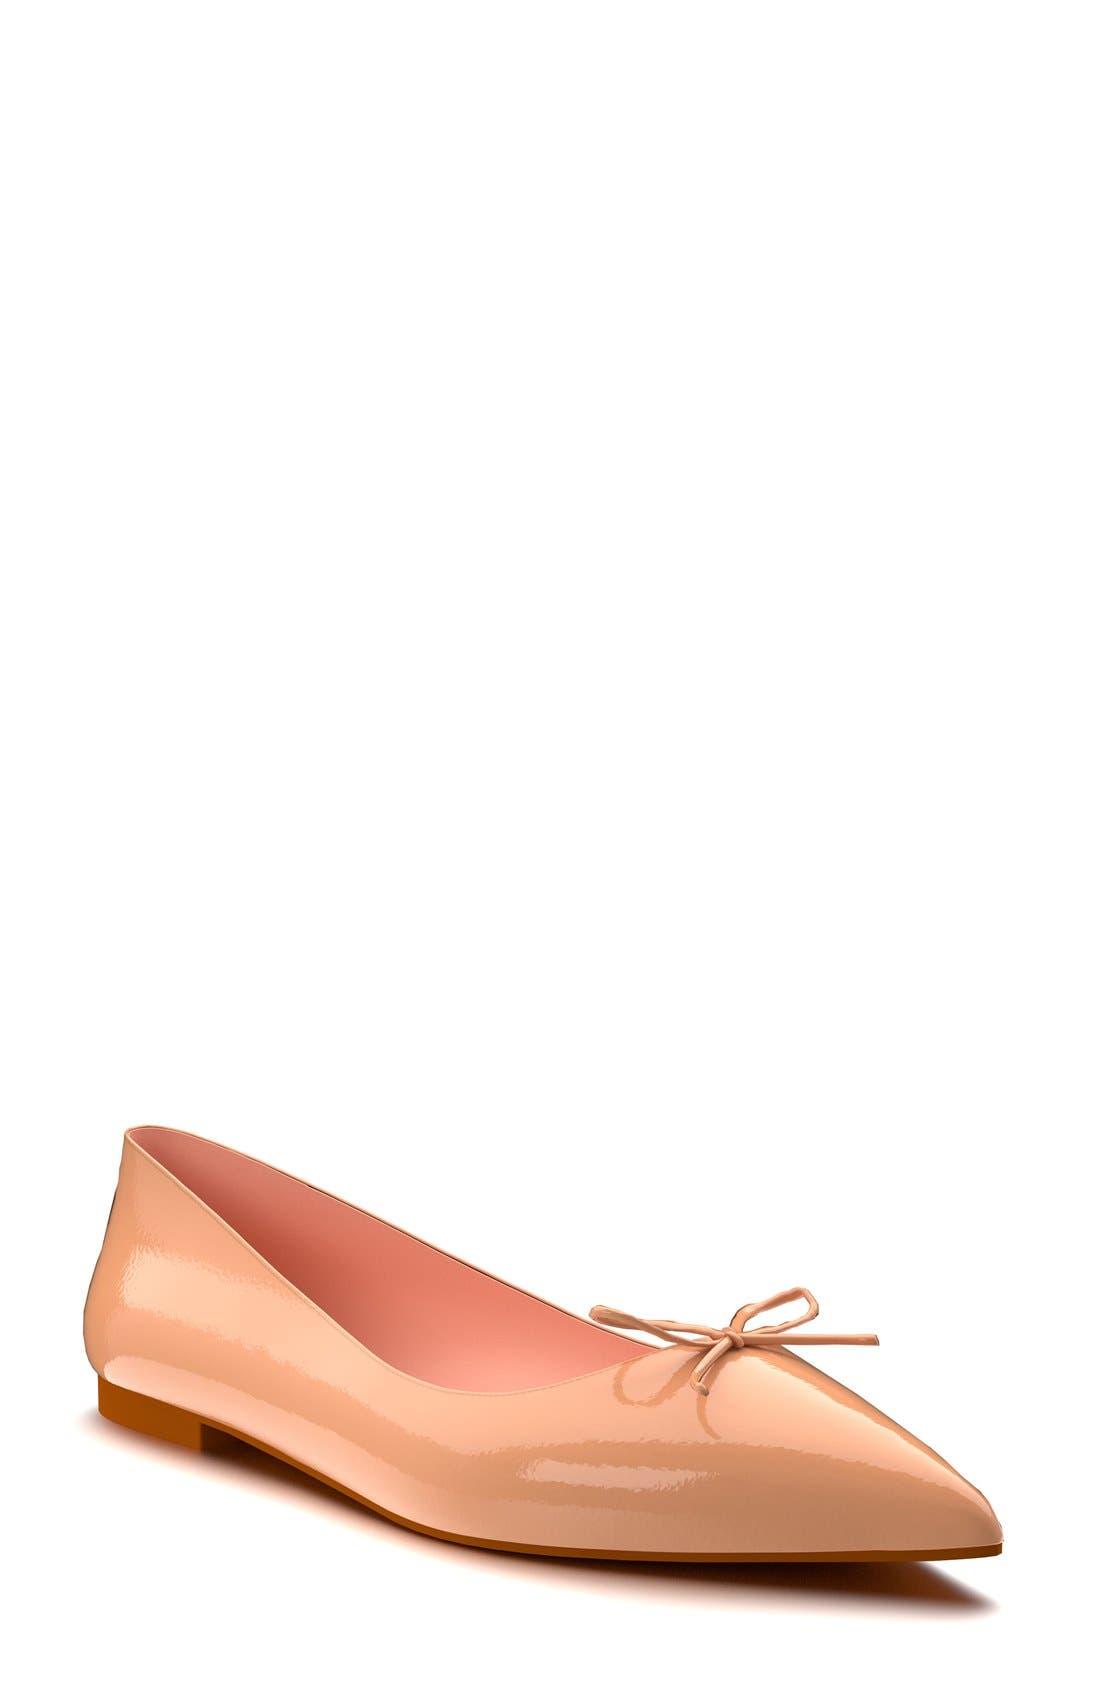 Pointy Toe Ballet Flat,                             Main thumbnail 1, color,                             250